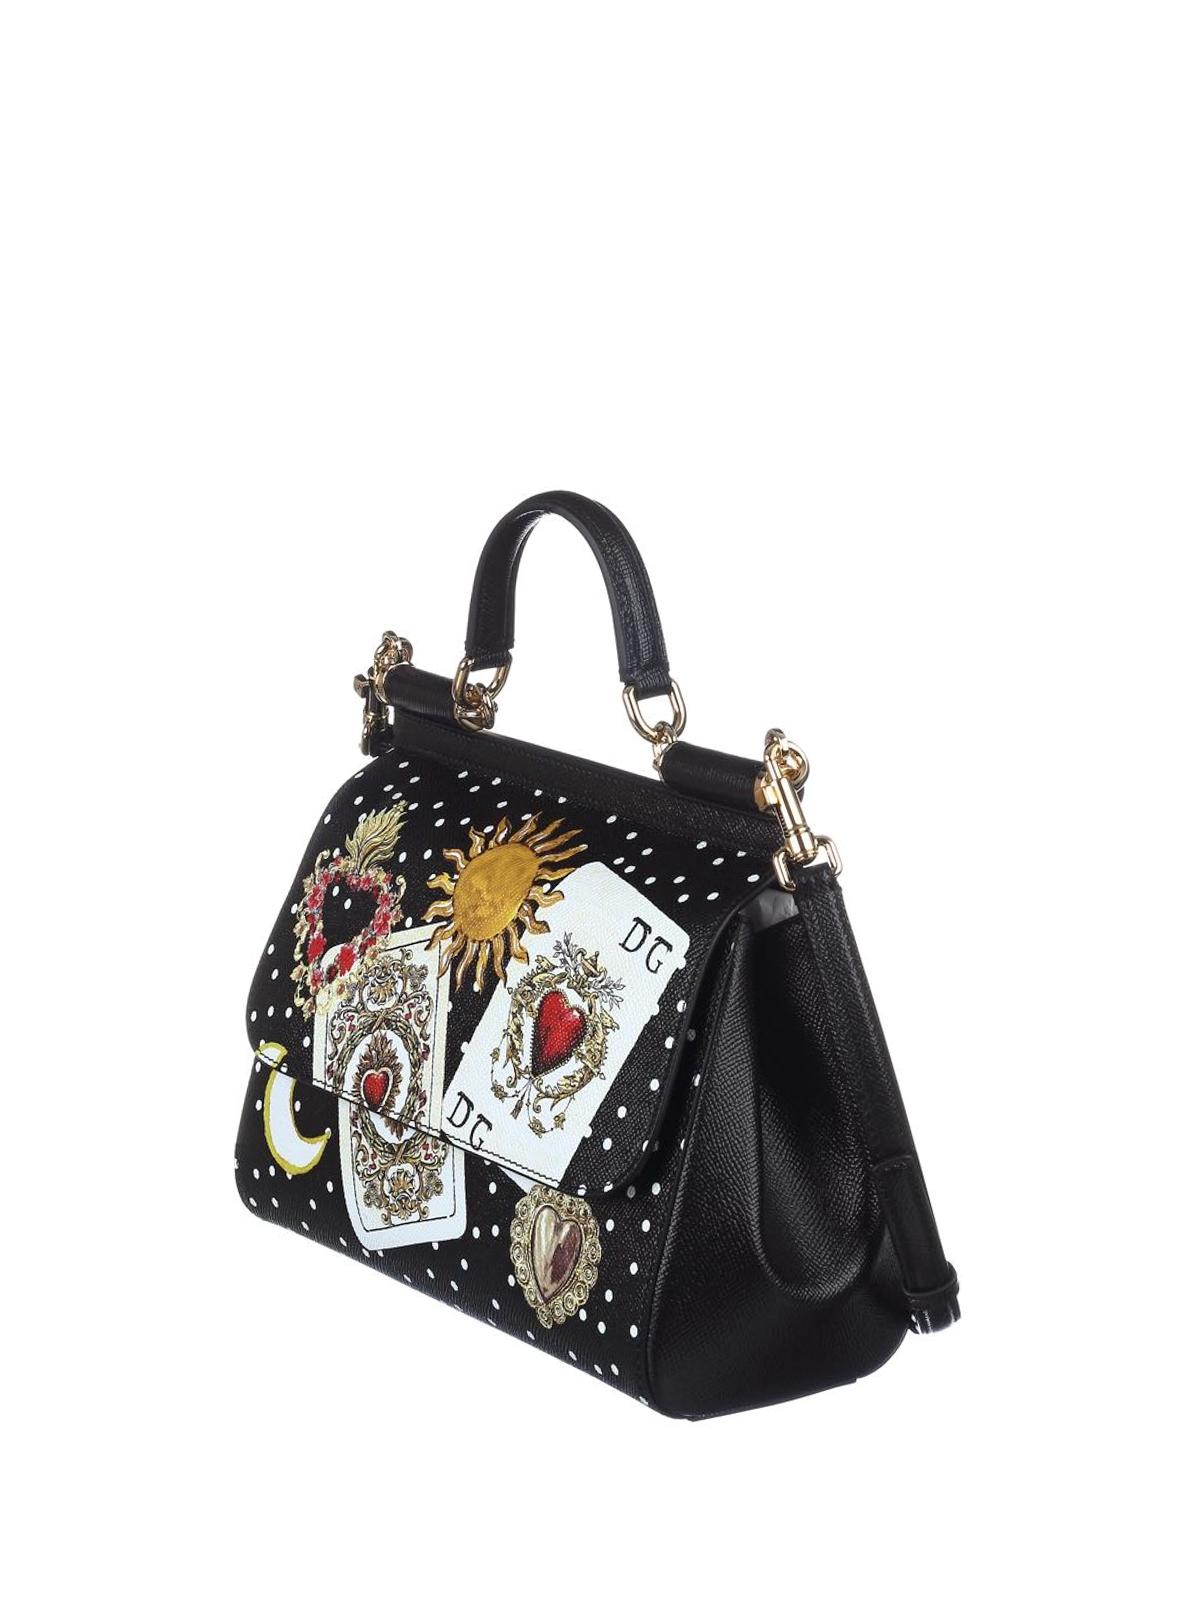 DOLCE   GABBANA  bowling bags online - Sicily dauphine leather medium bag 6c70c43a6df30